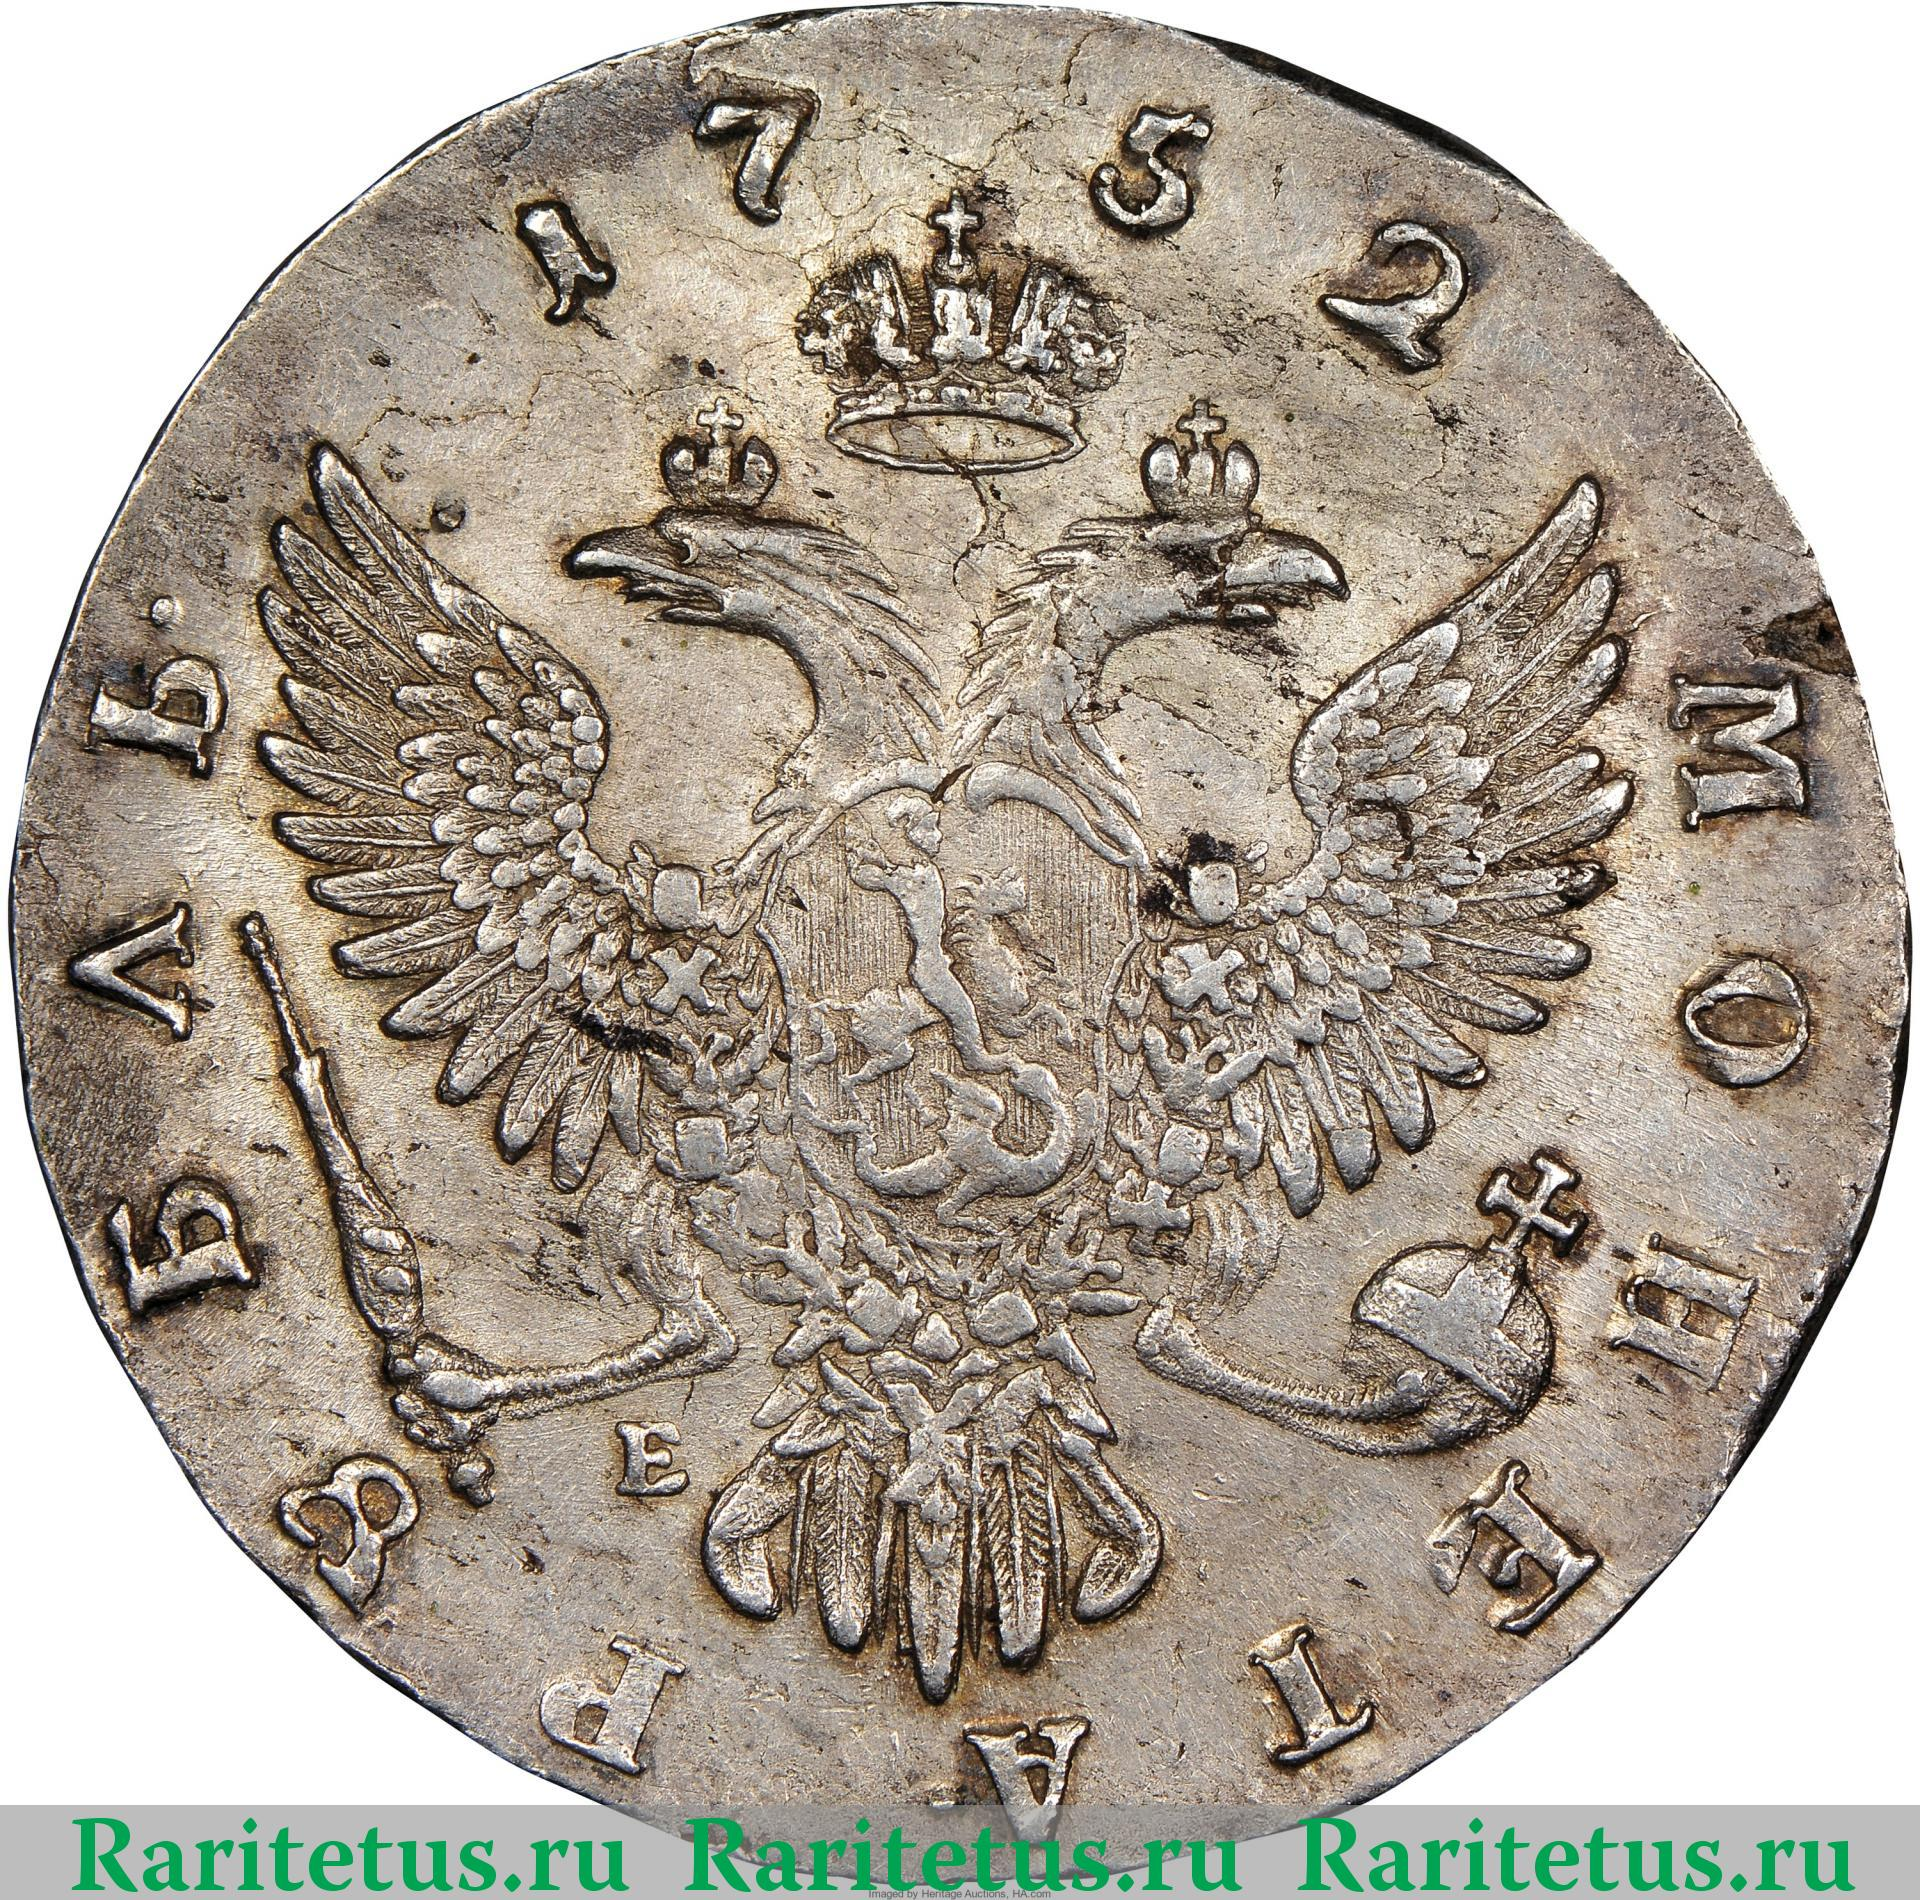 ... Russia: Elizabeth Rouble 1752 MMΔ-E AU53 NGC,, Аукцион: Heritage за